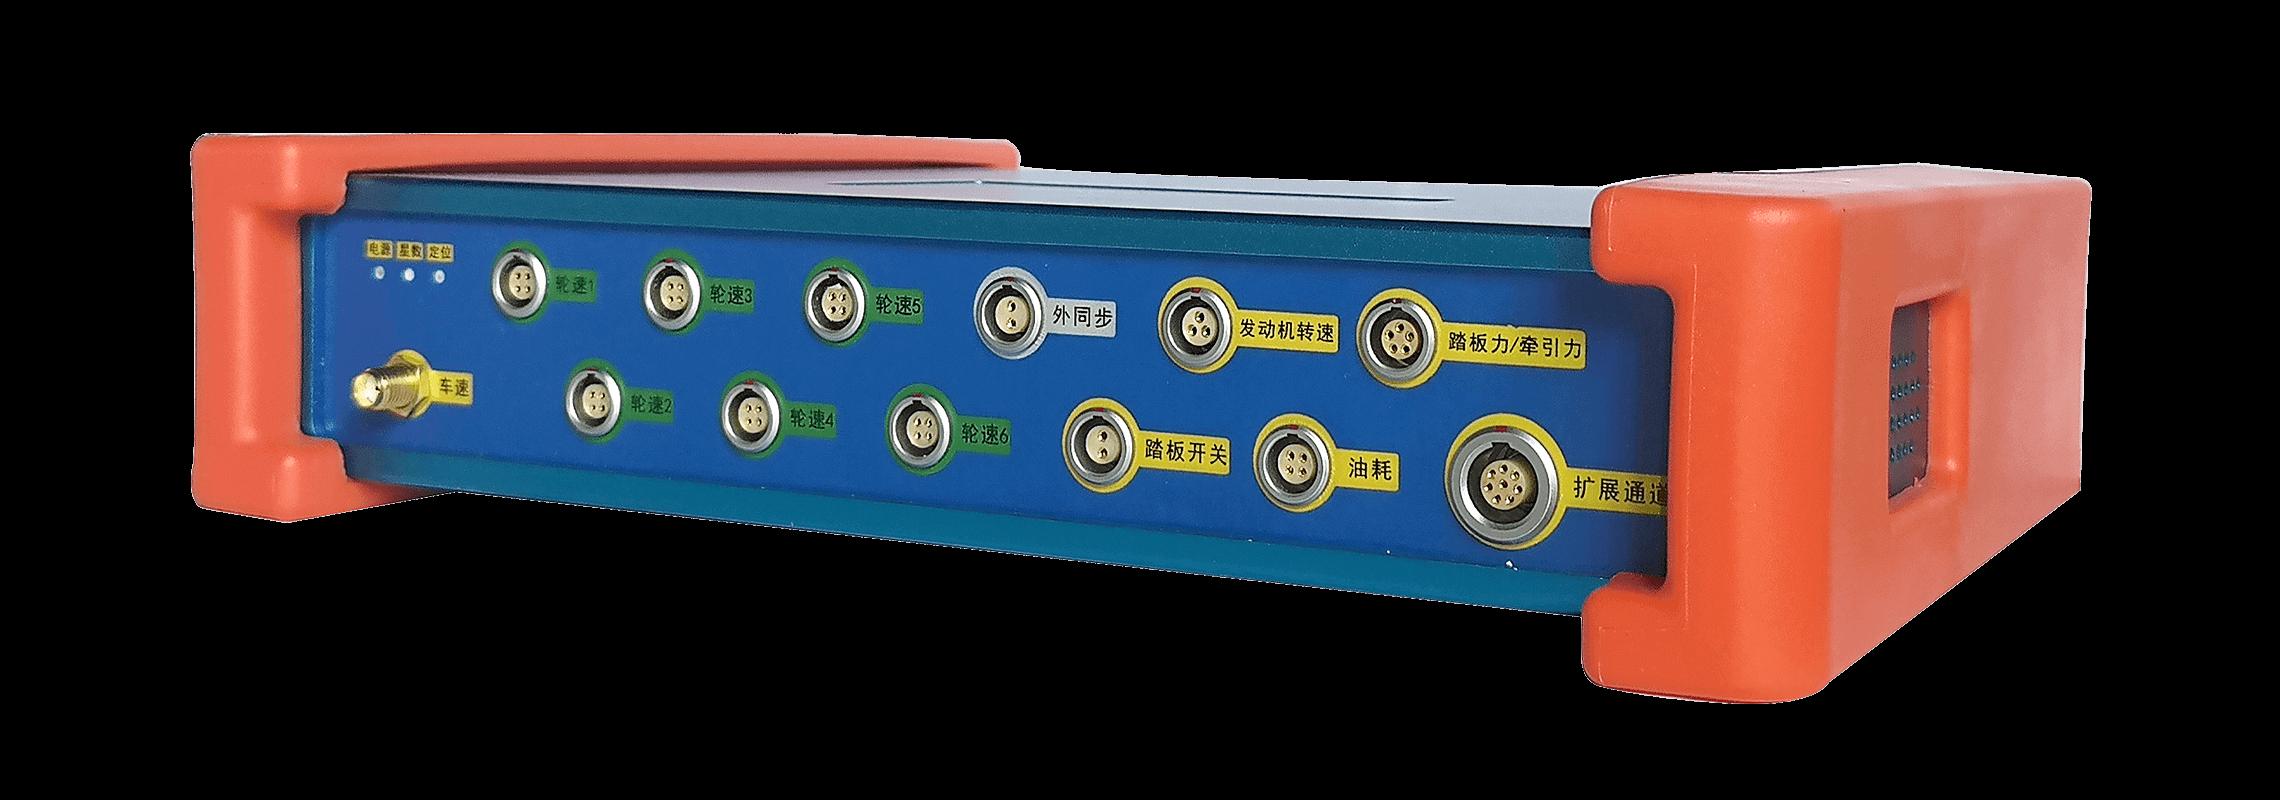 PCM-6851R数据采集器